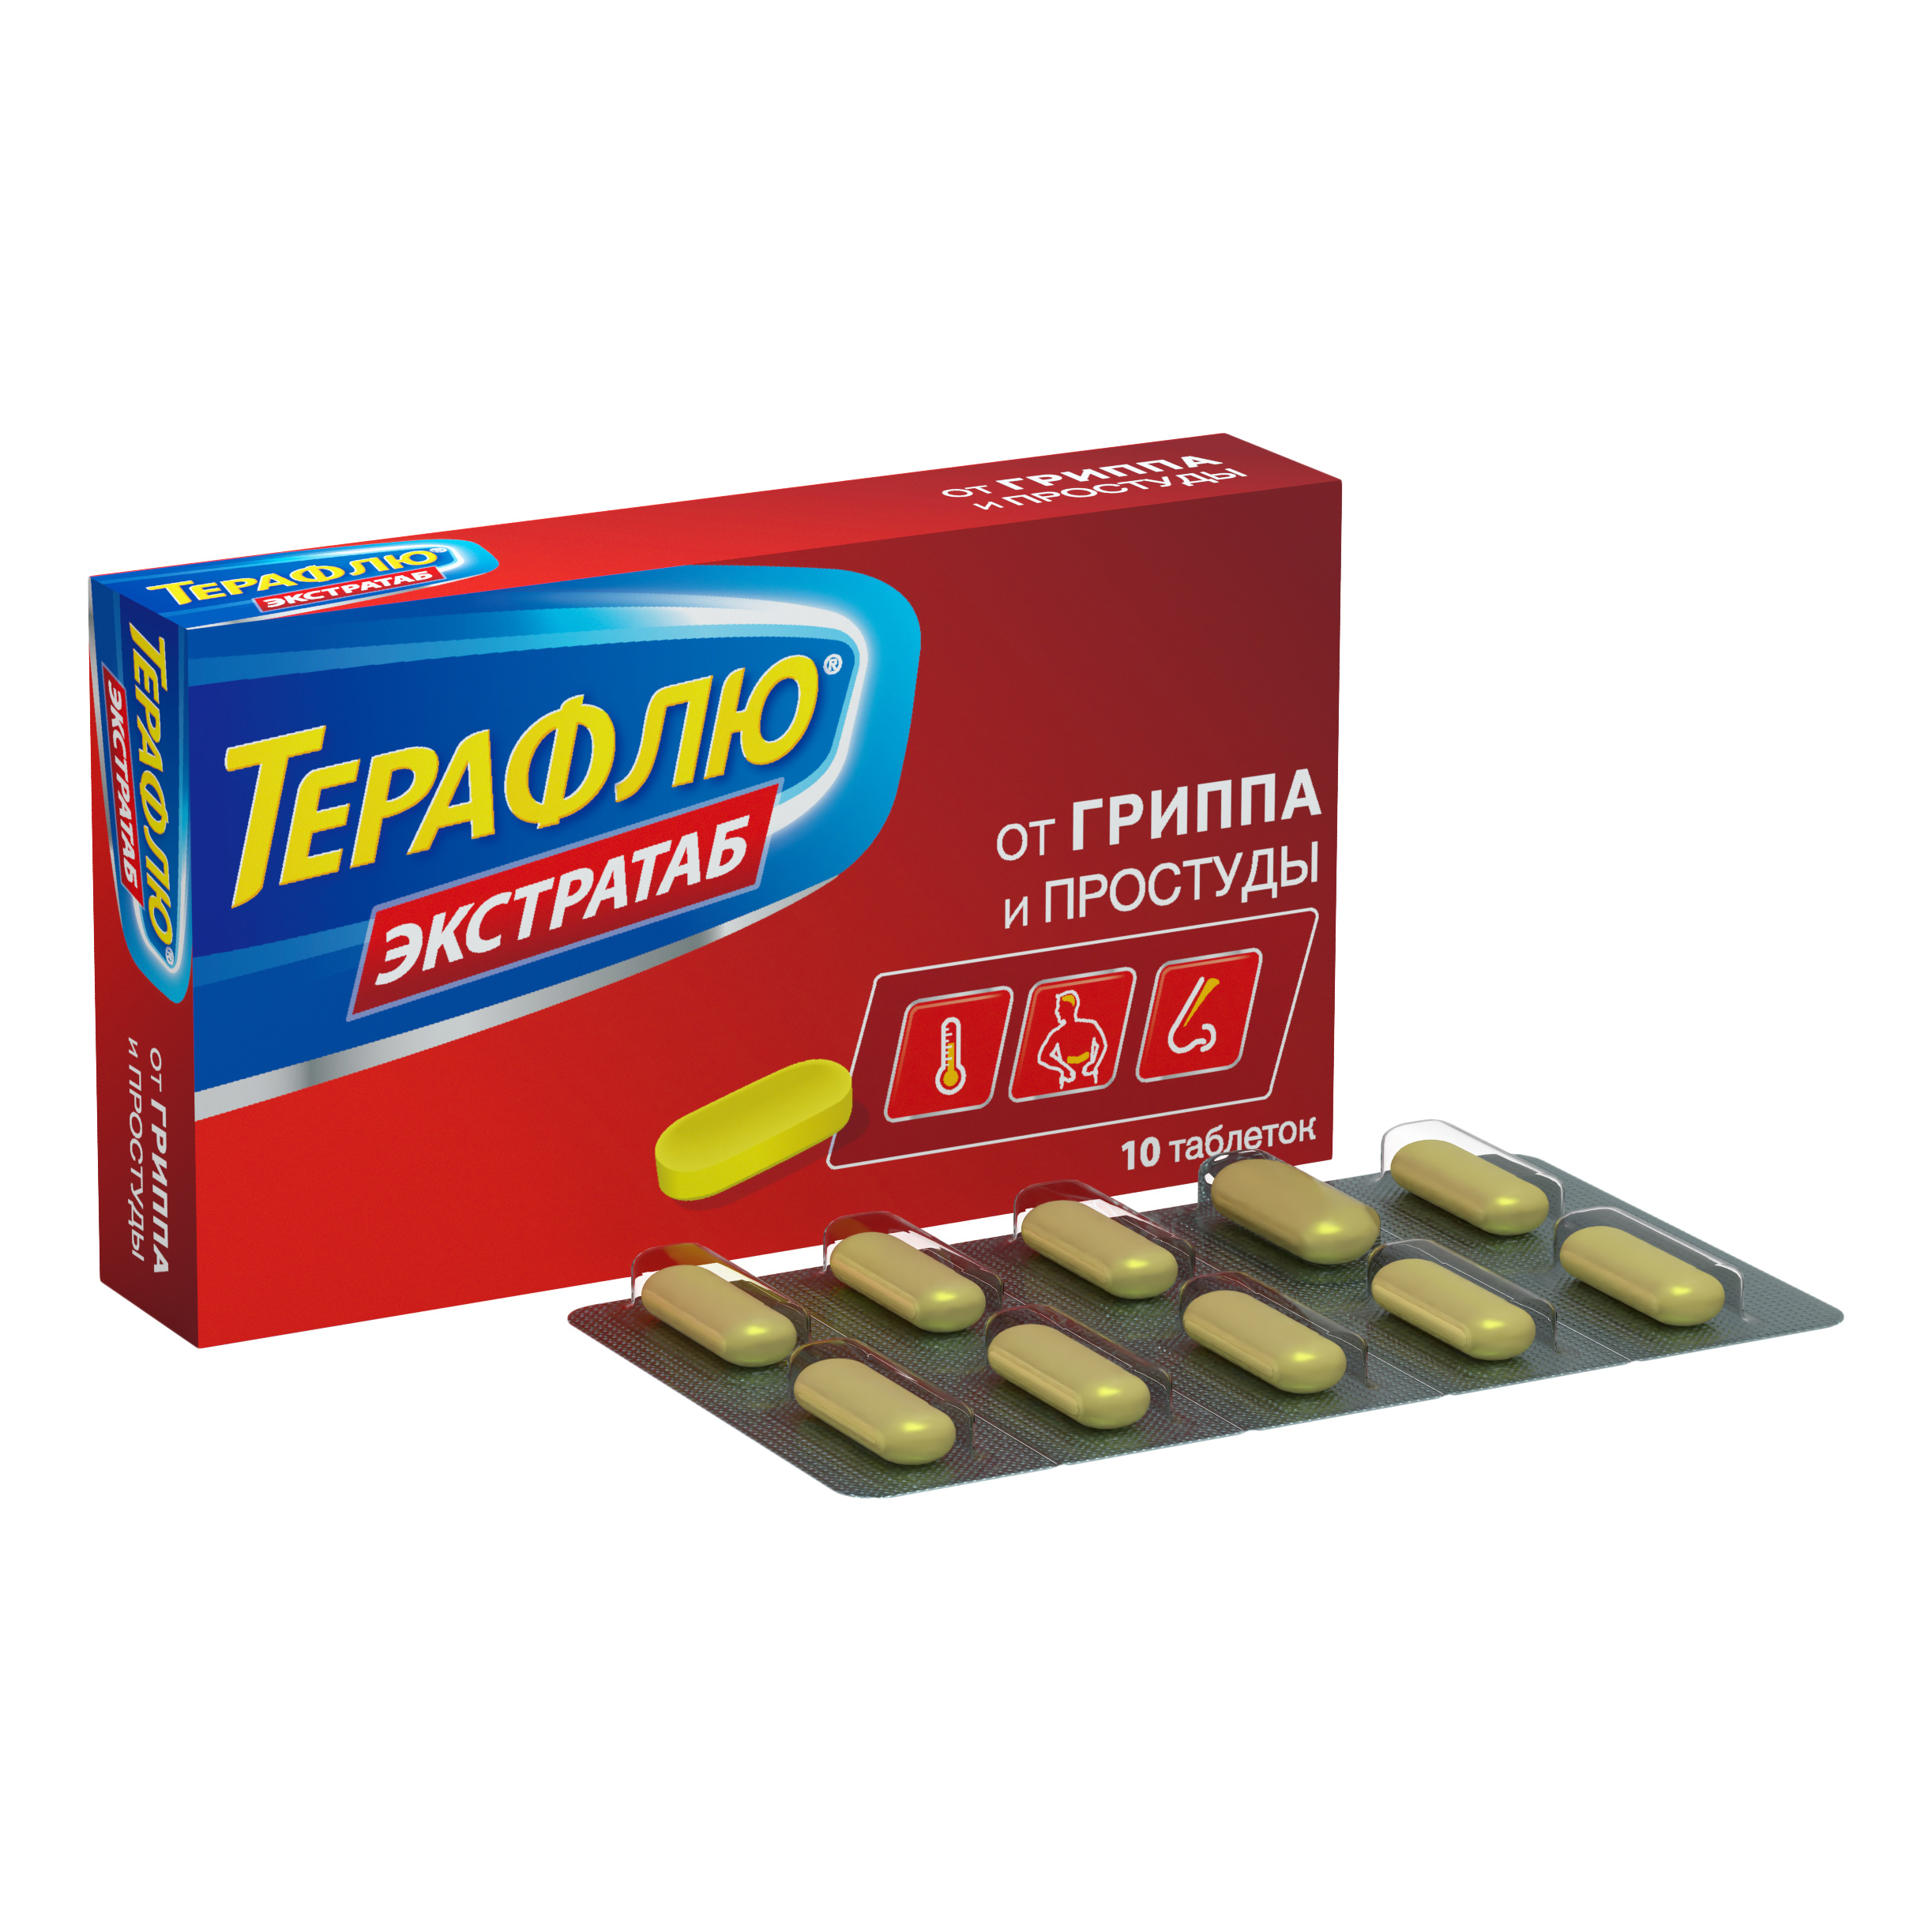 ТераФлю Экстратаб таблетки 10 шт.